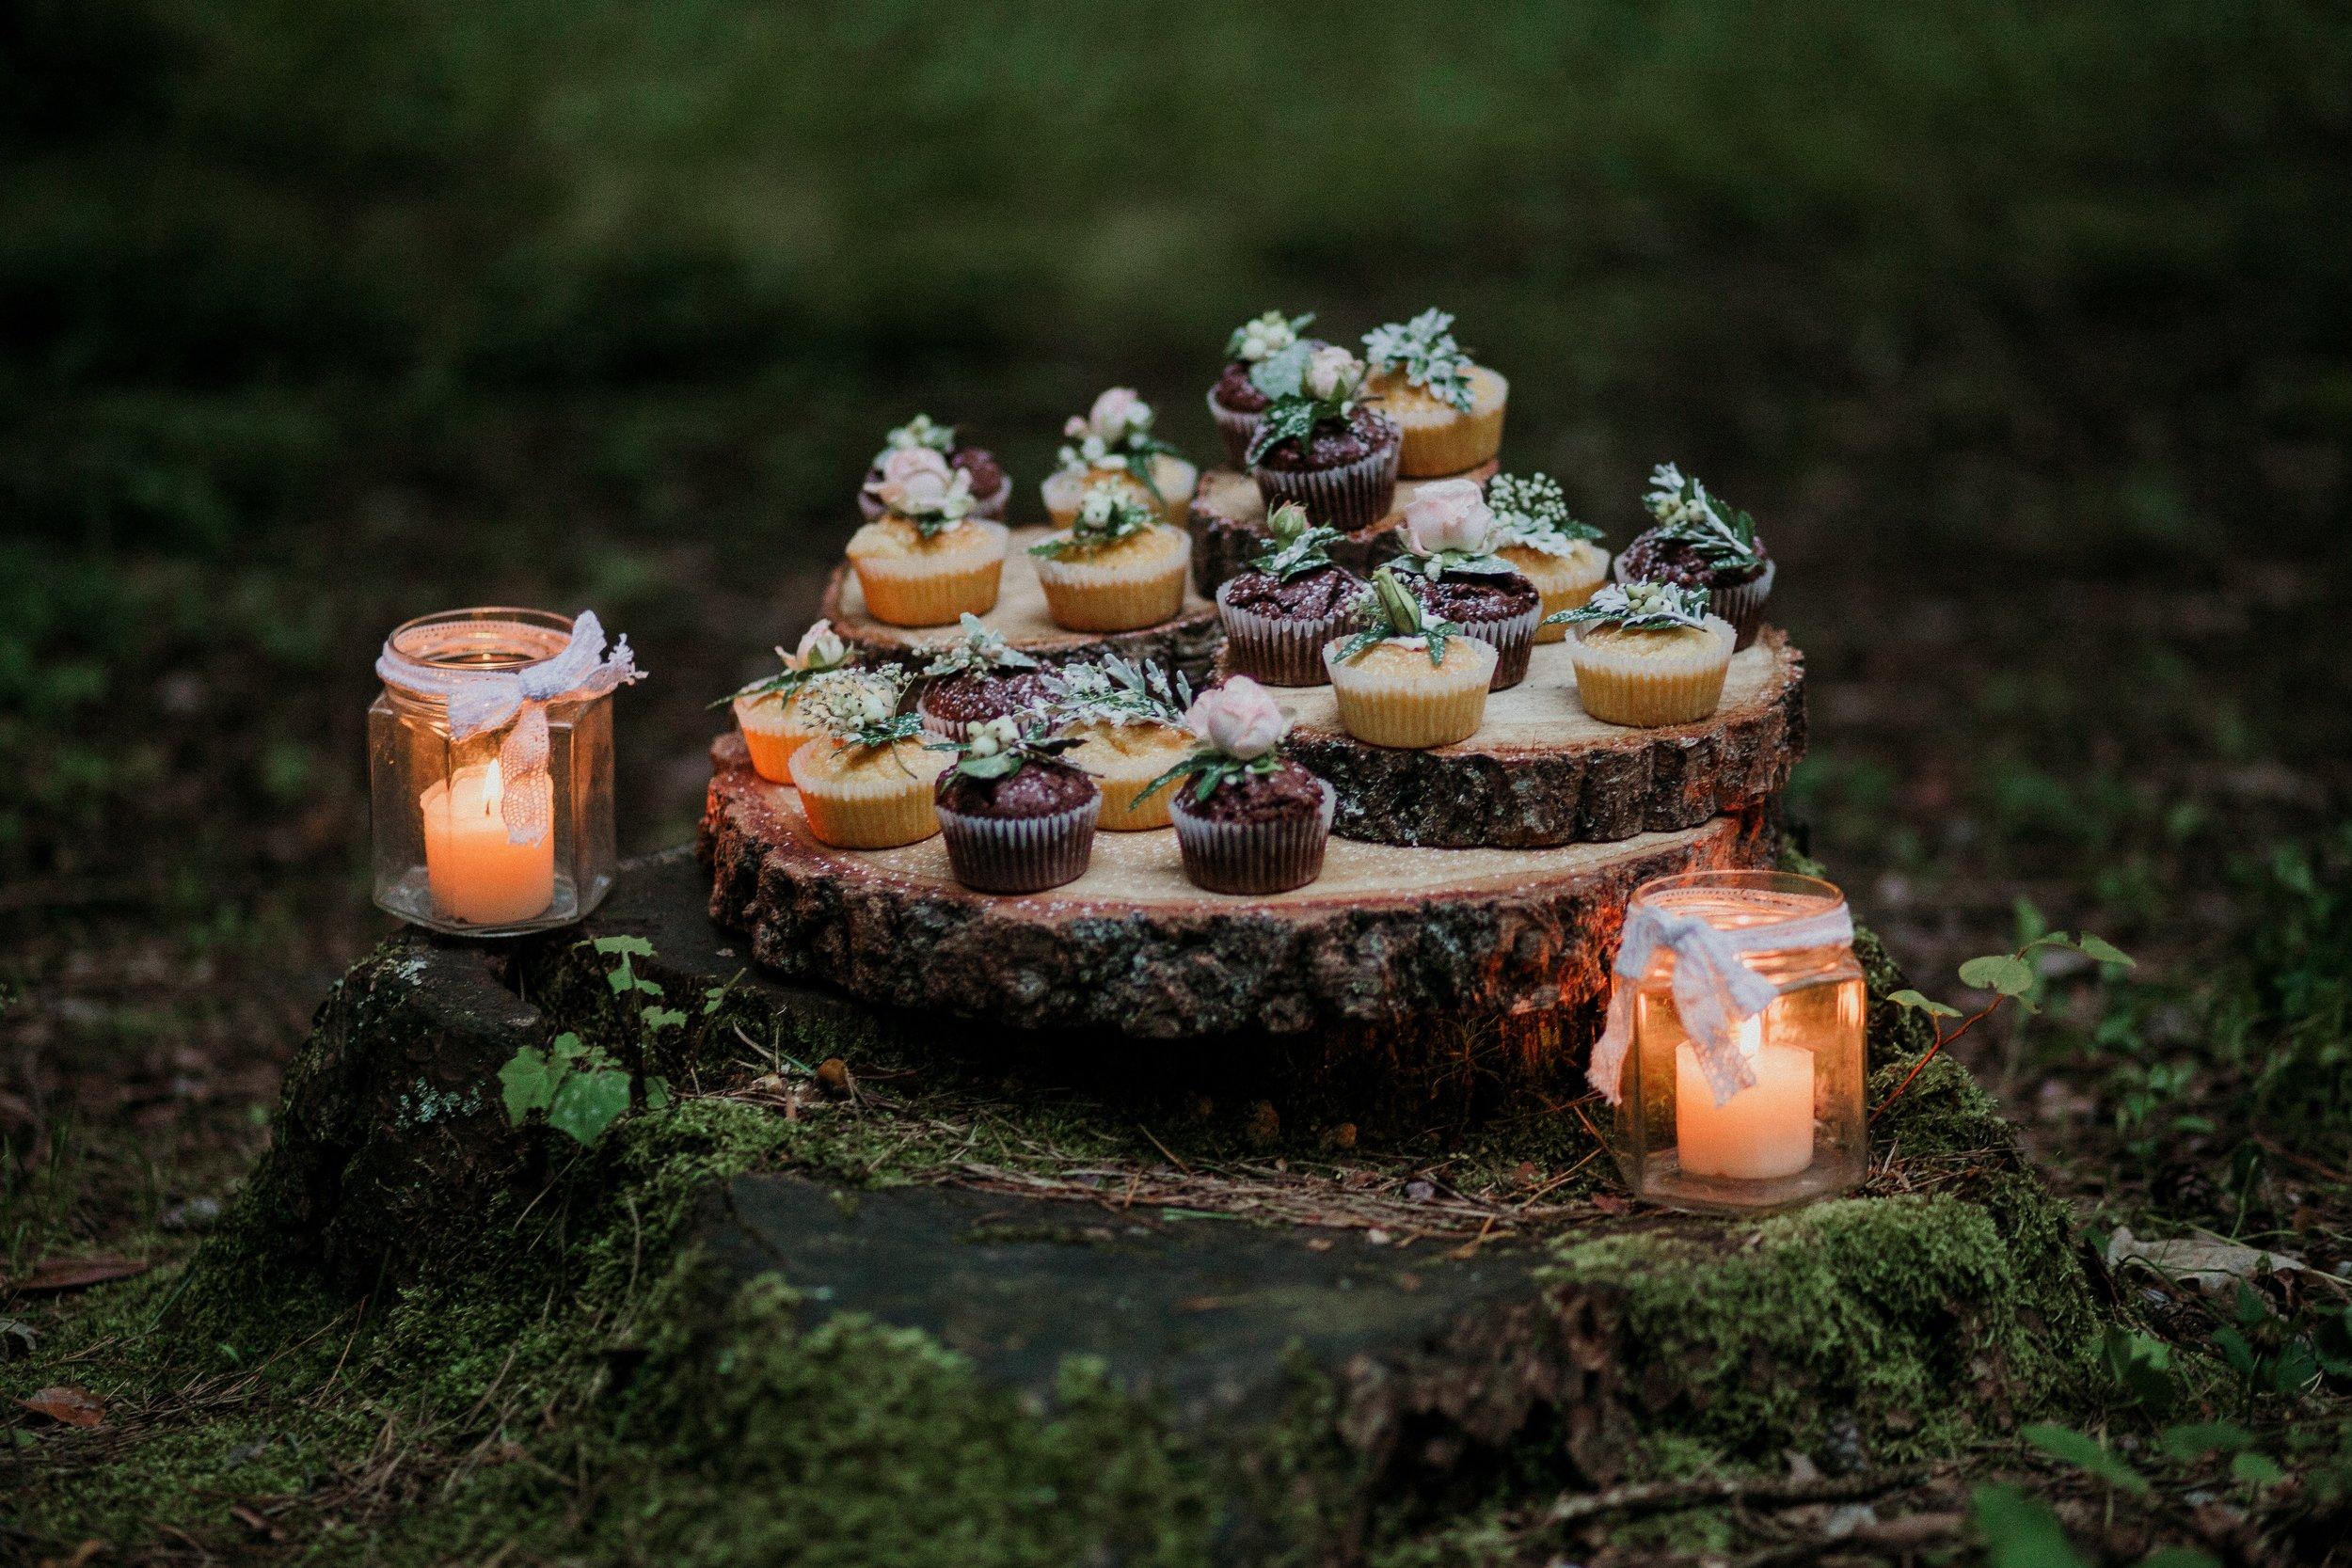 birthday-blur-cake-226292.jpg